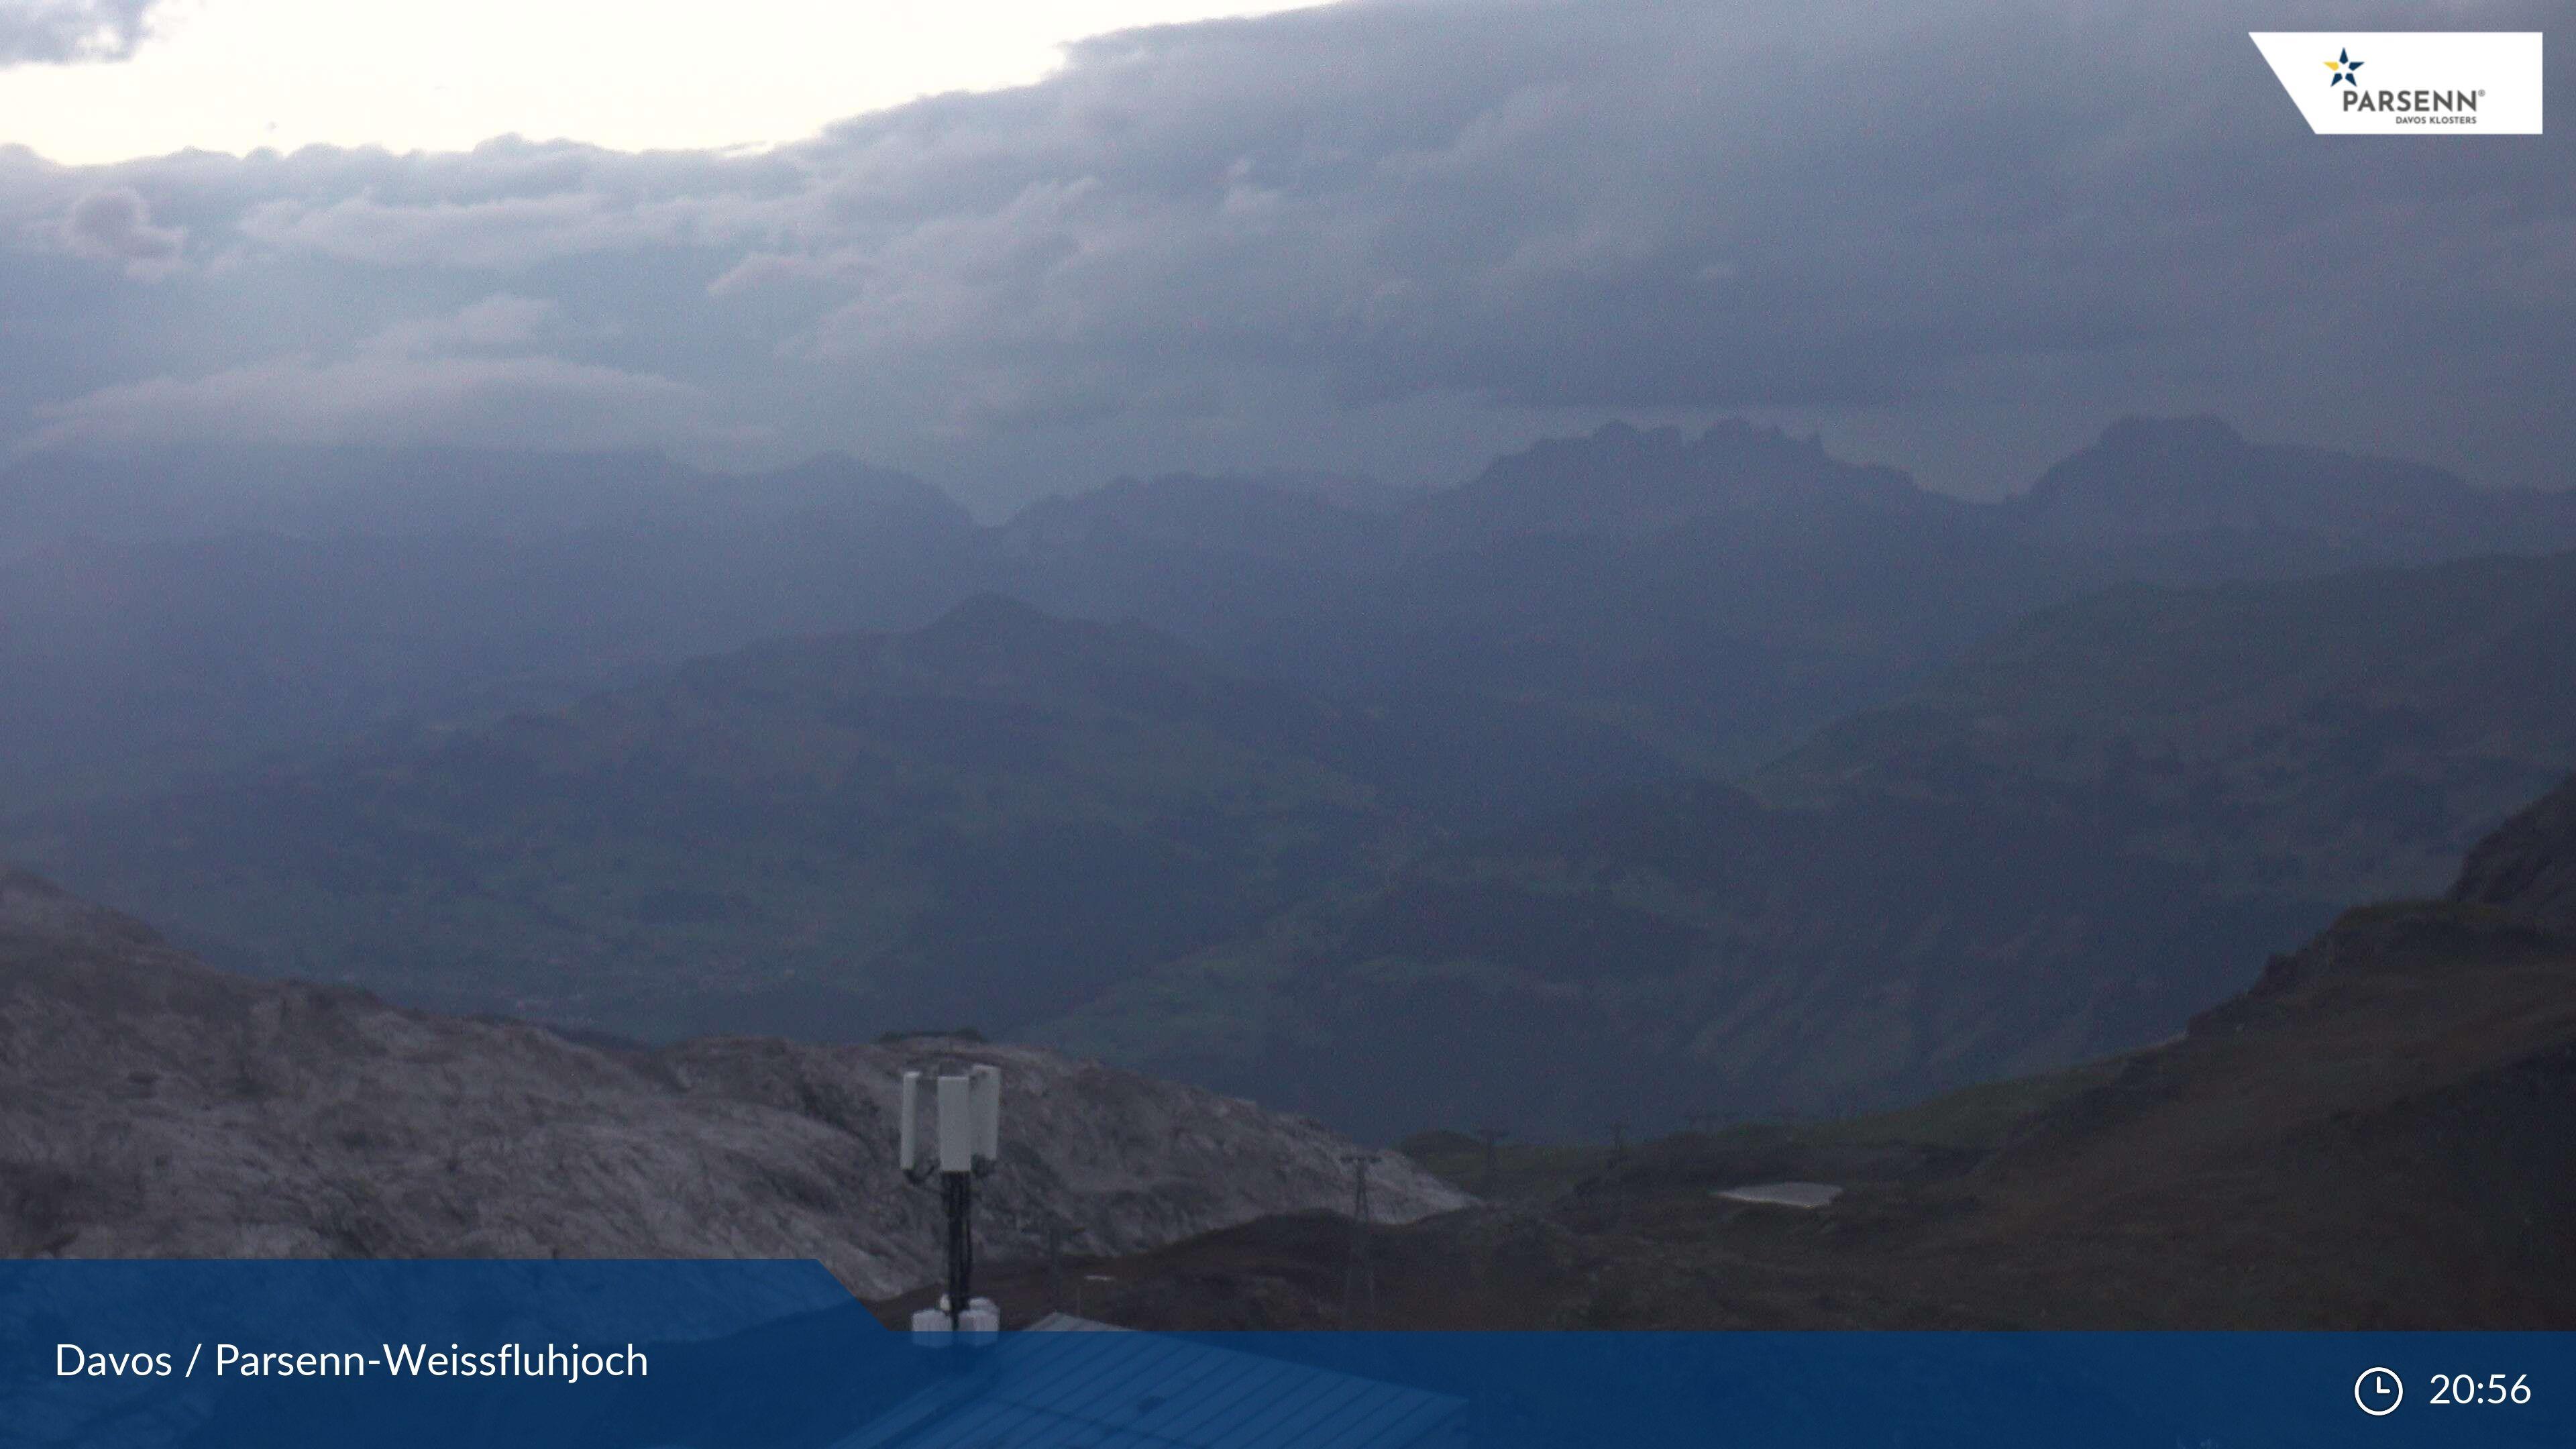 Davos: Dorf - Weissfluhjoch, Blick Schifer